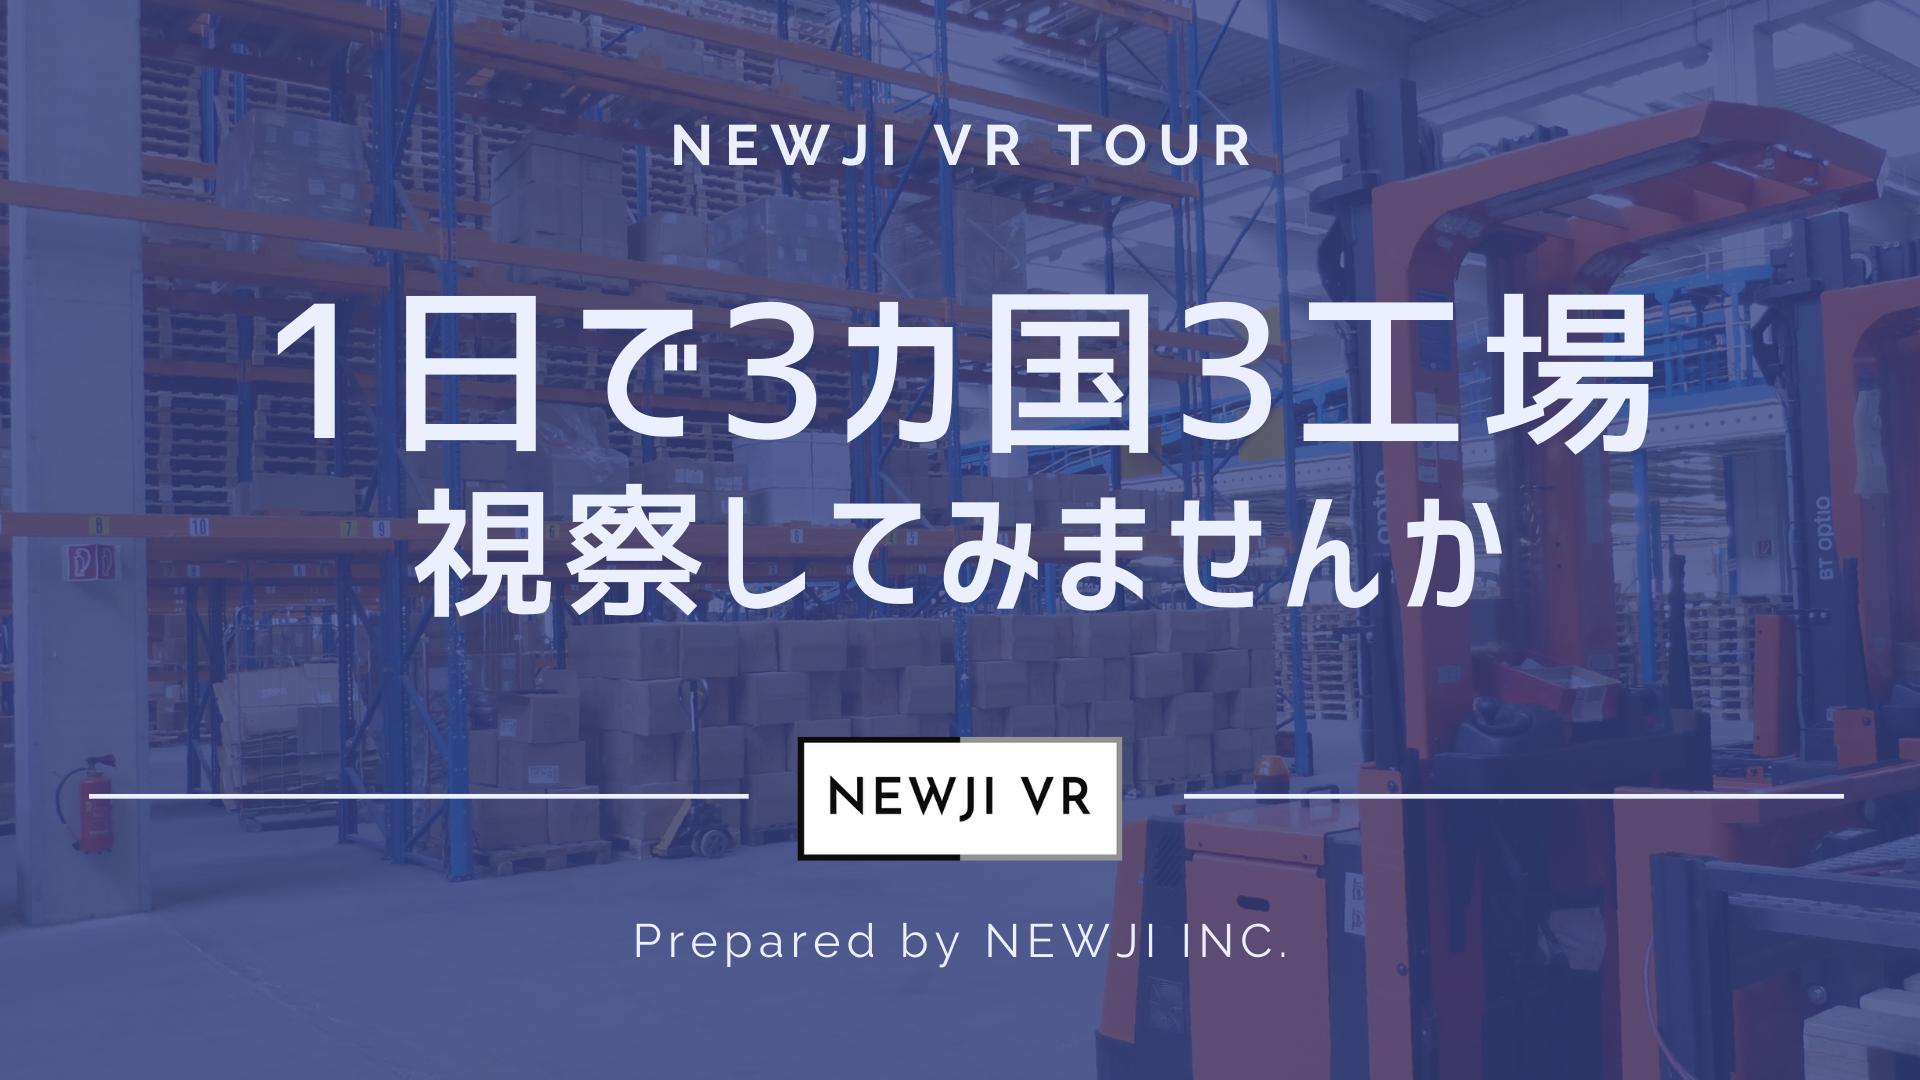 NEWJI VR TOUR